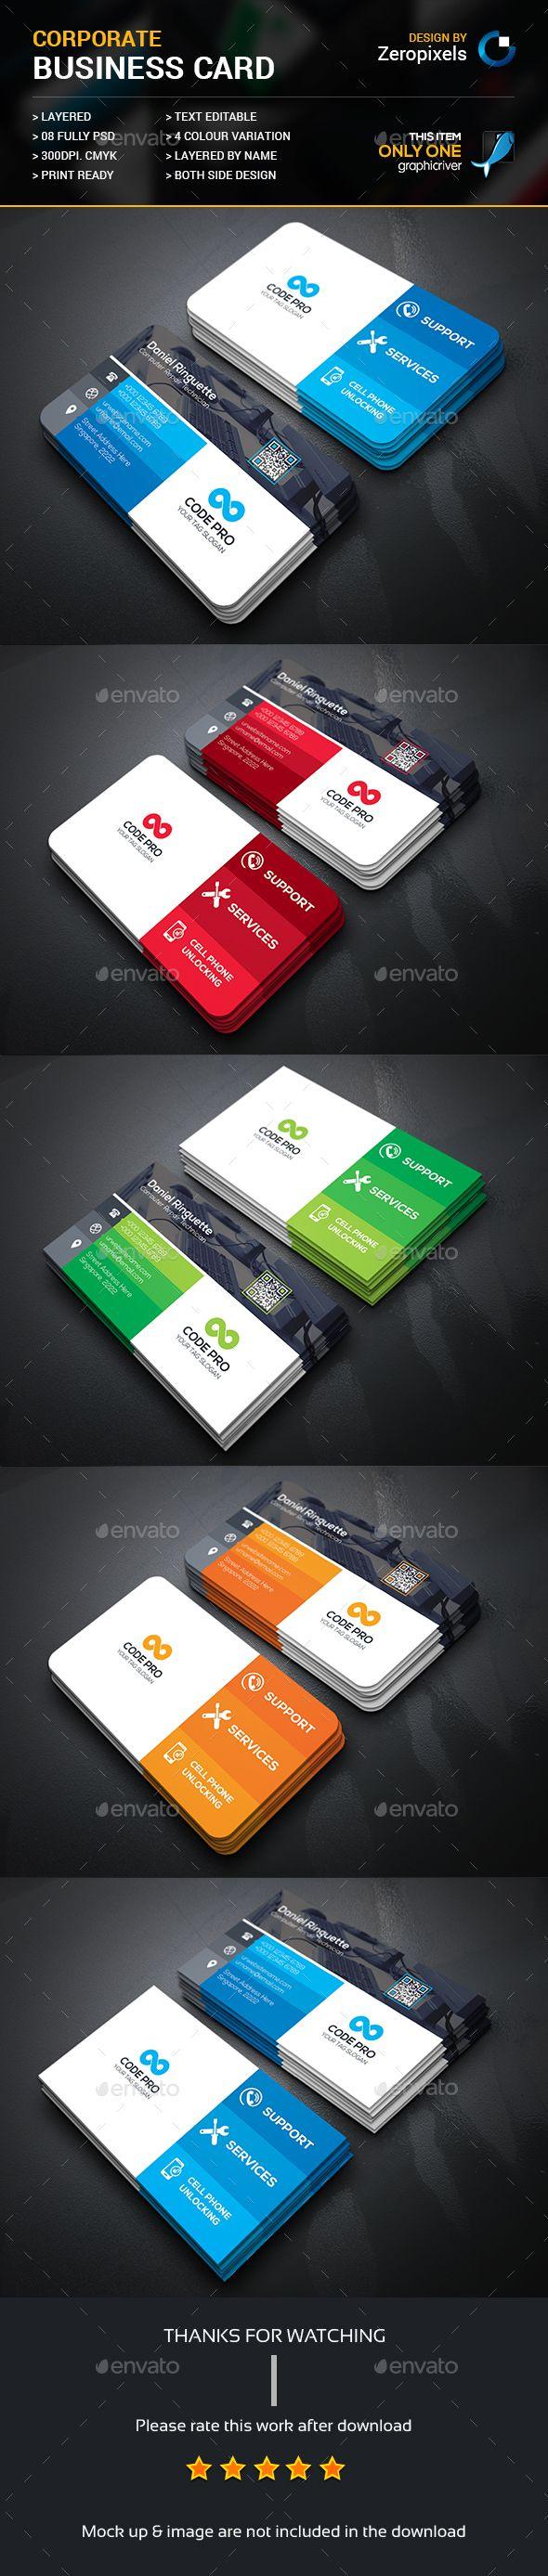 198 best Business Cards images on Pinterest | Business card design ...